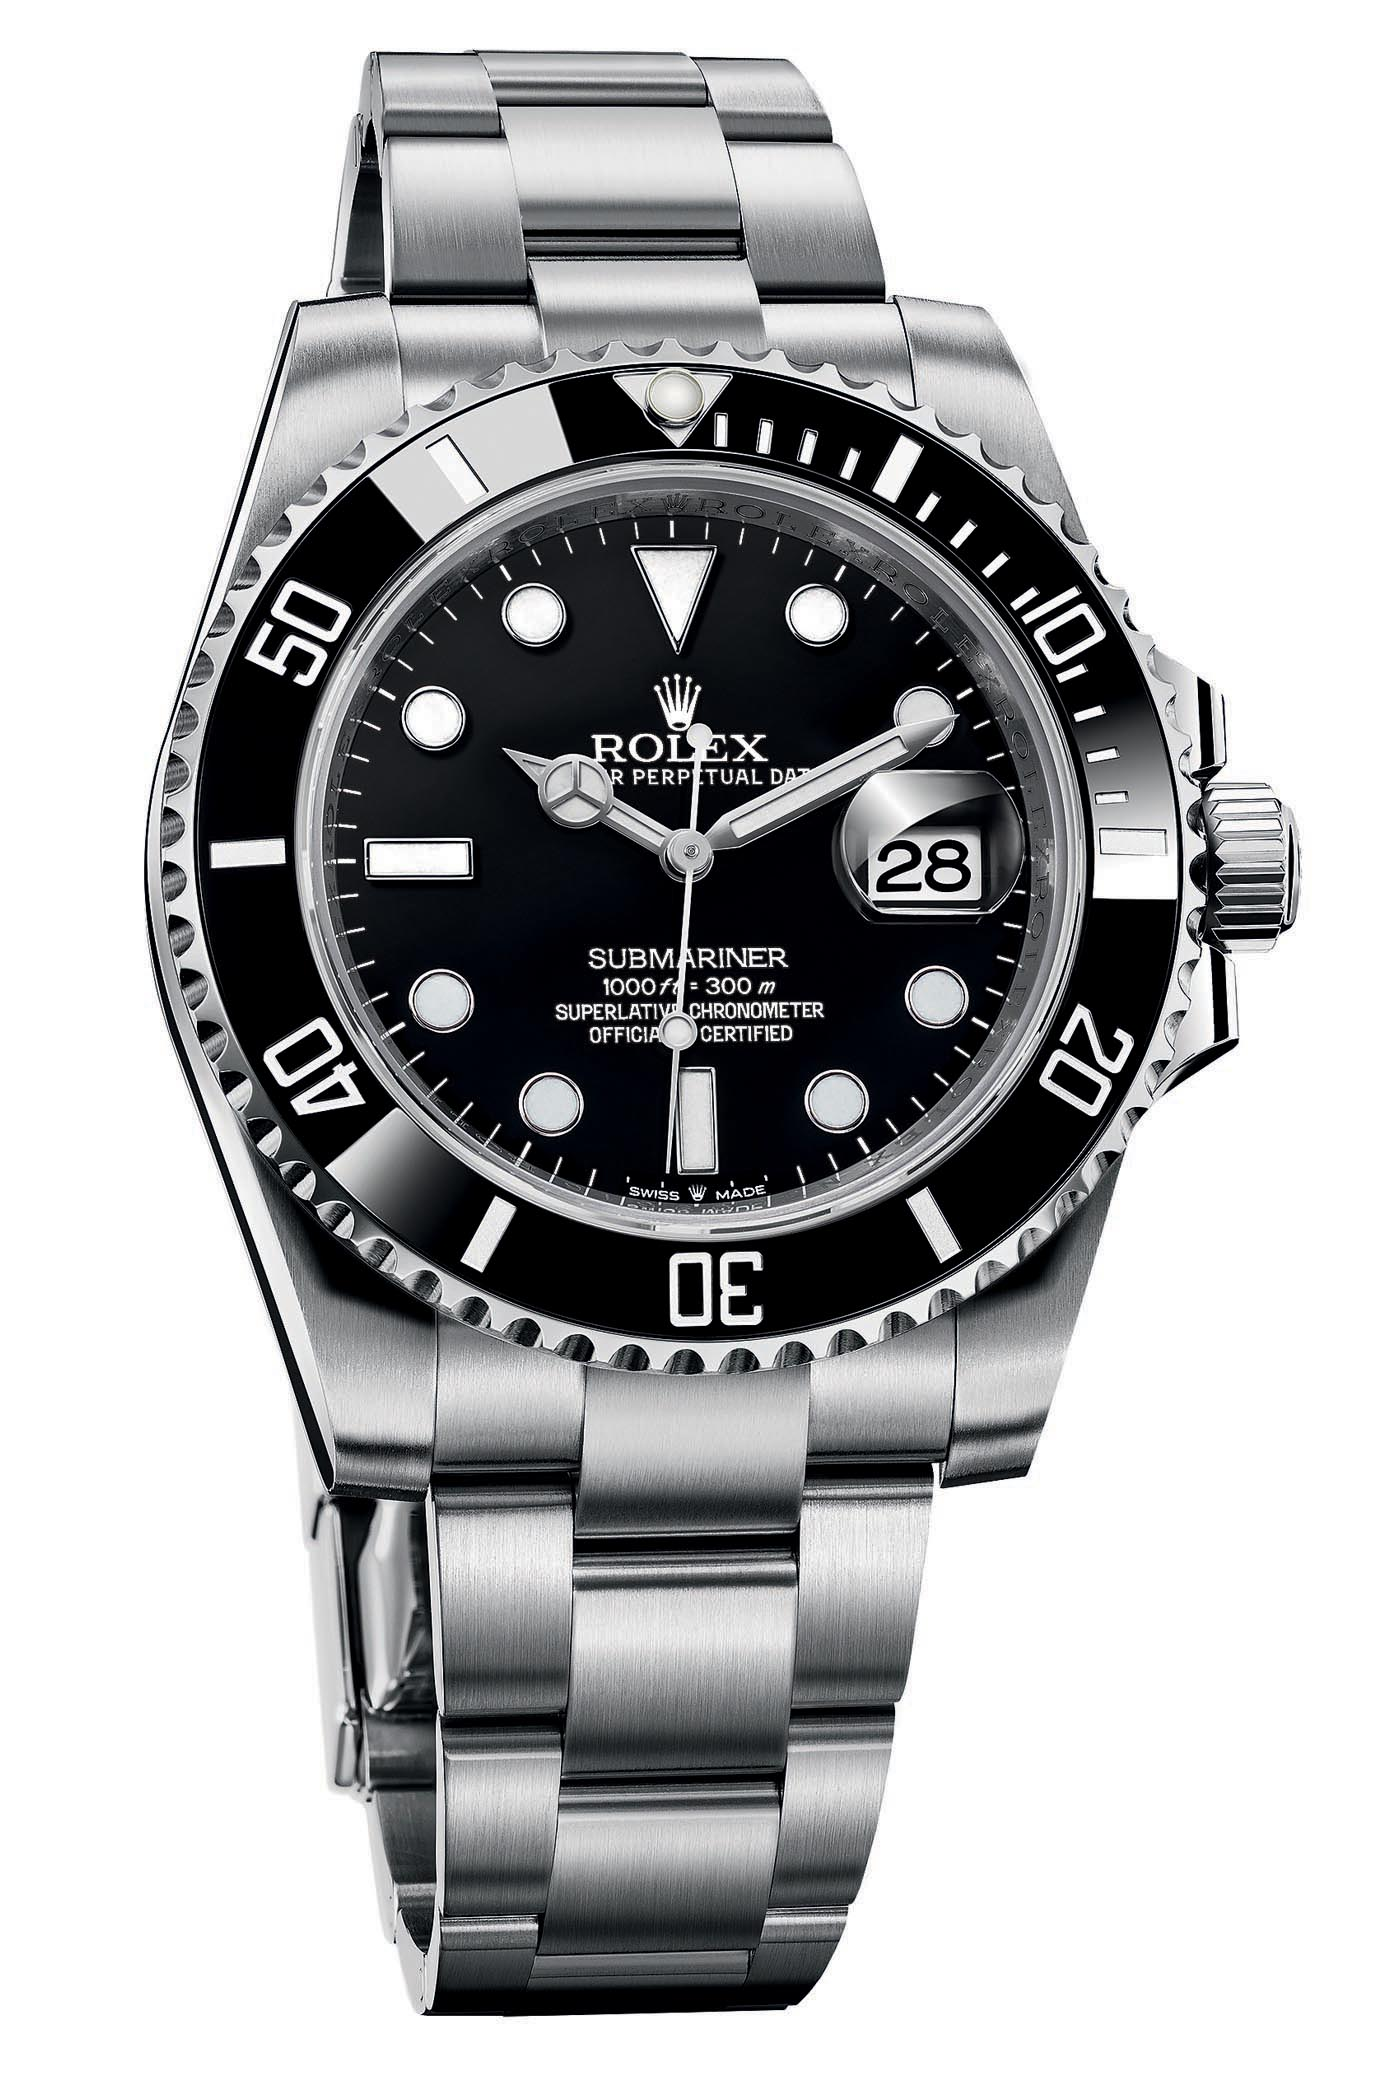 Rolex Submariner 2019 Calibre 3235 ref 126610LN - Rolex Baselworld 2019 - Rolex 2019 Predictions - Monochrome Watches